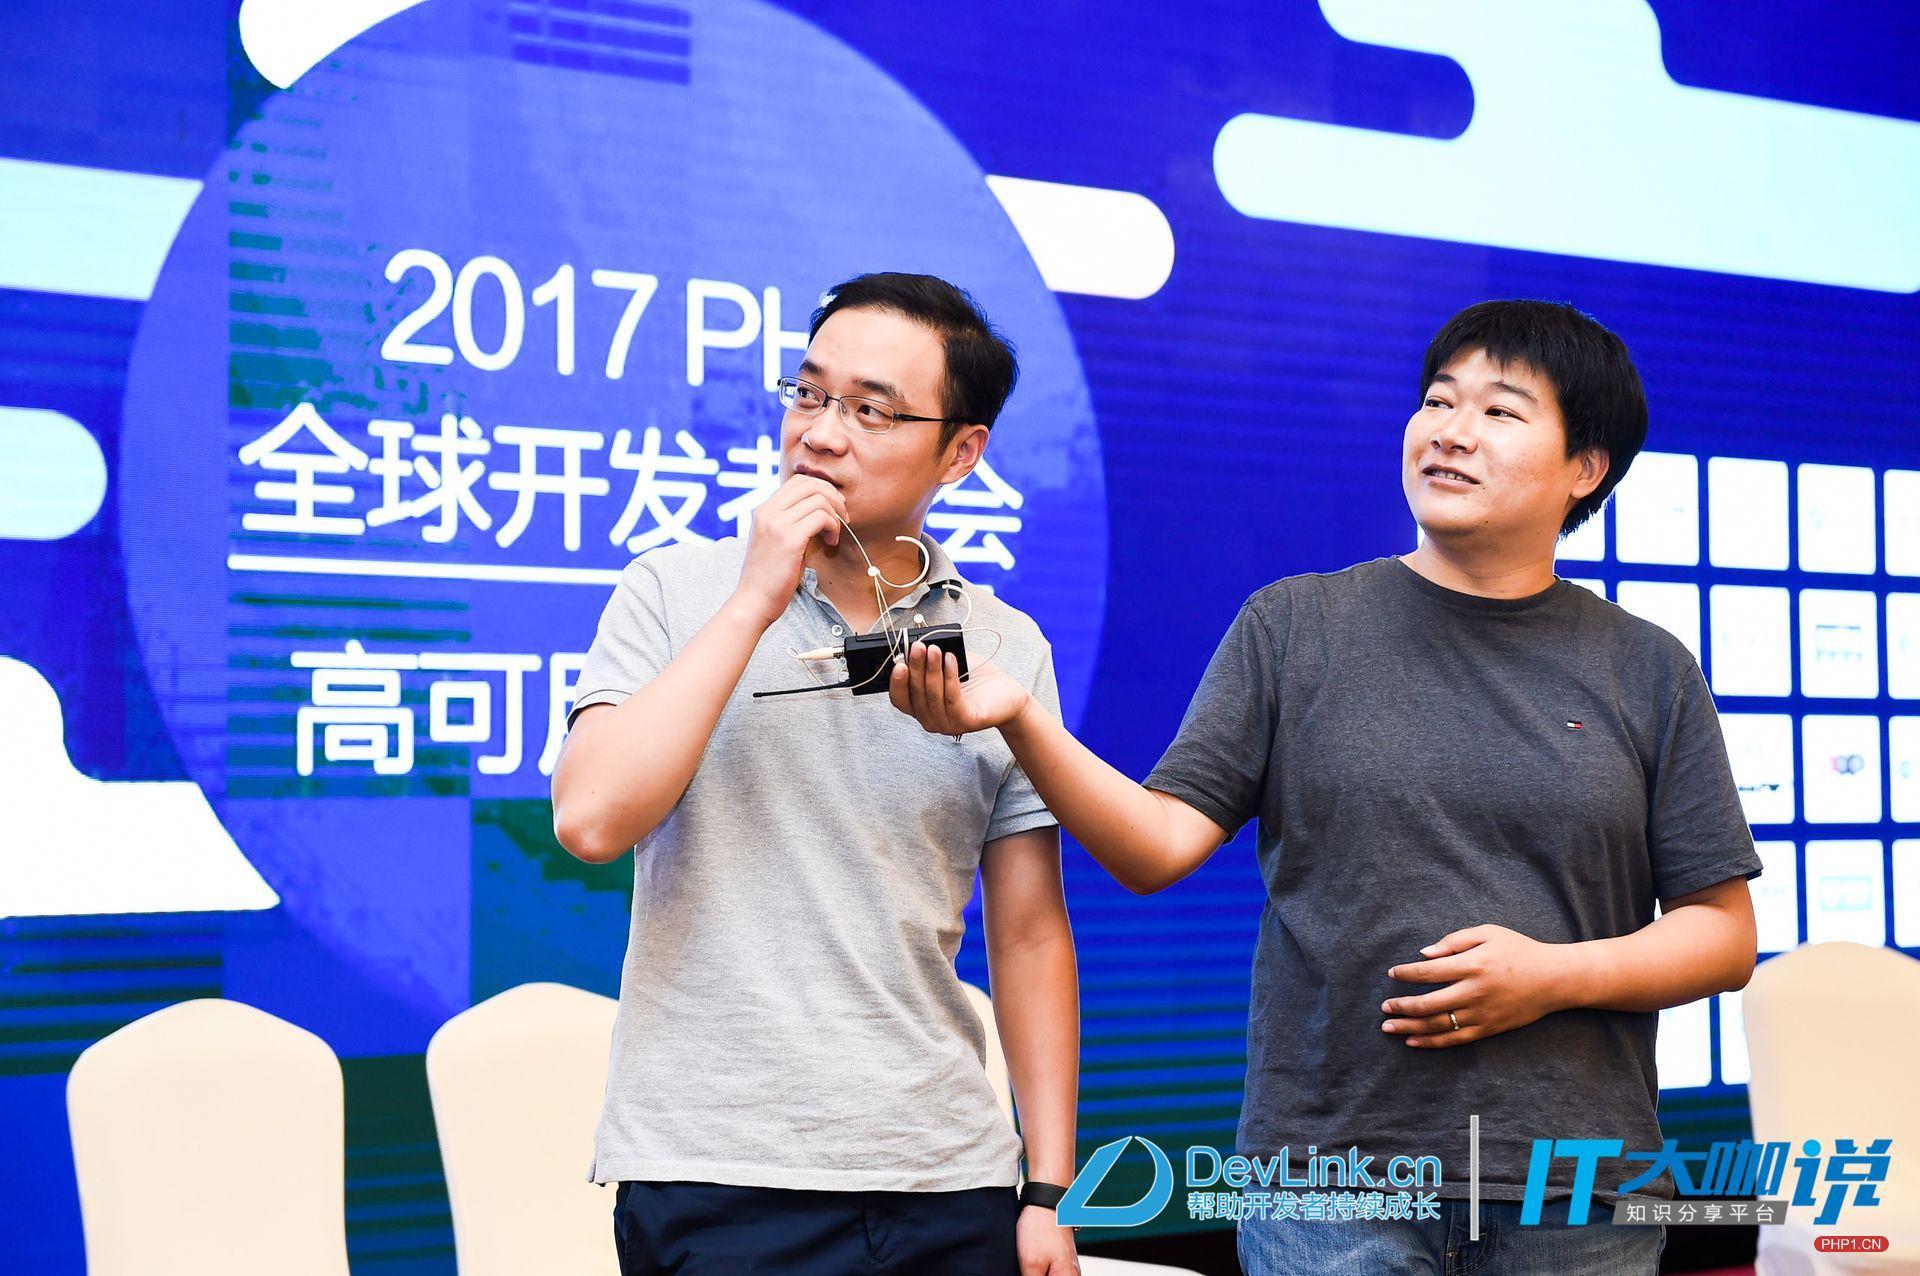 2017PHP开发者大会第二天精彩演讲回顾